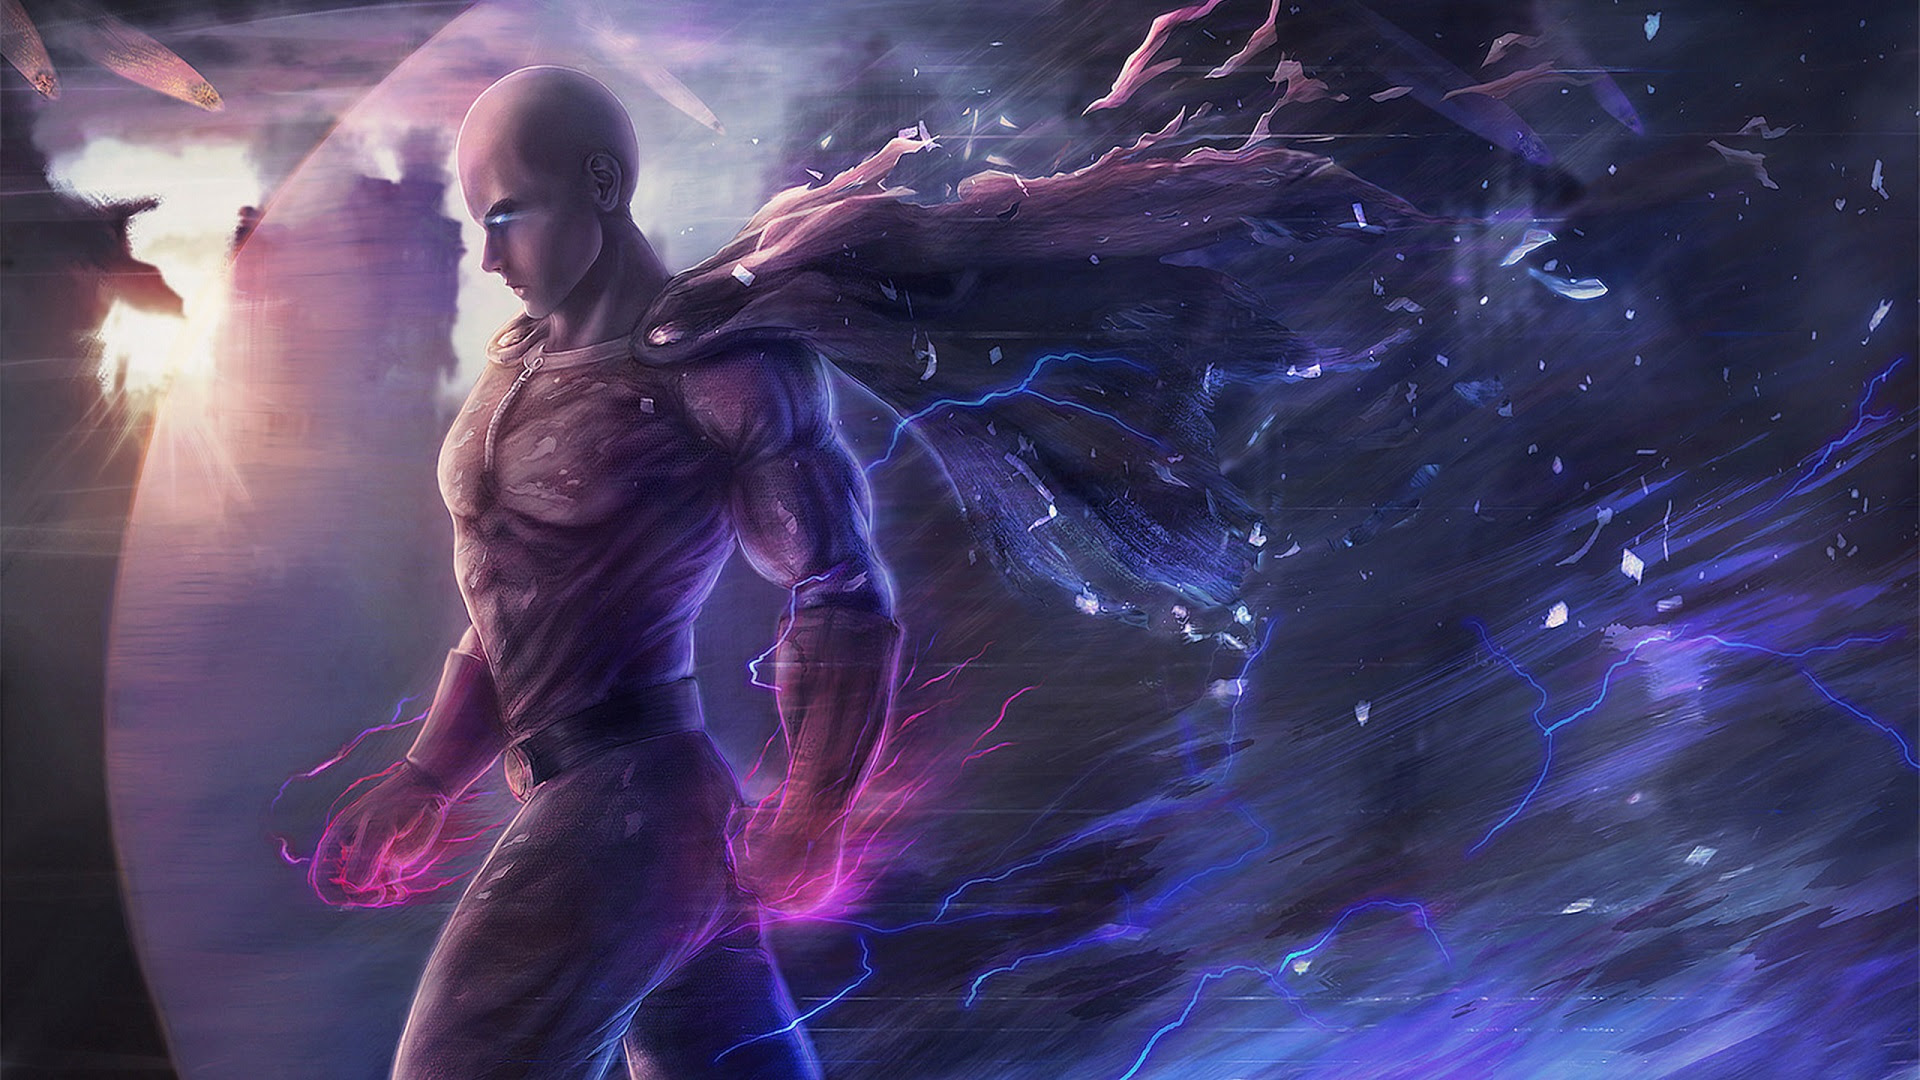 Saitama One Punch Man Artwork, HD Anime, 4k Wallpapers ...